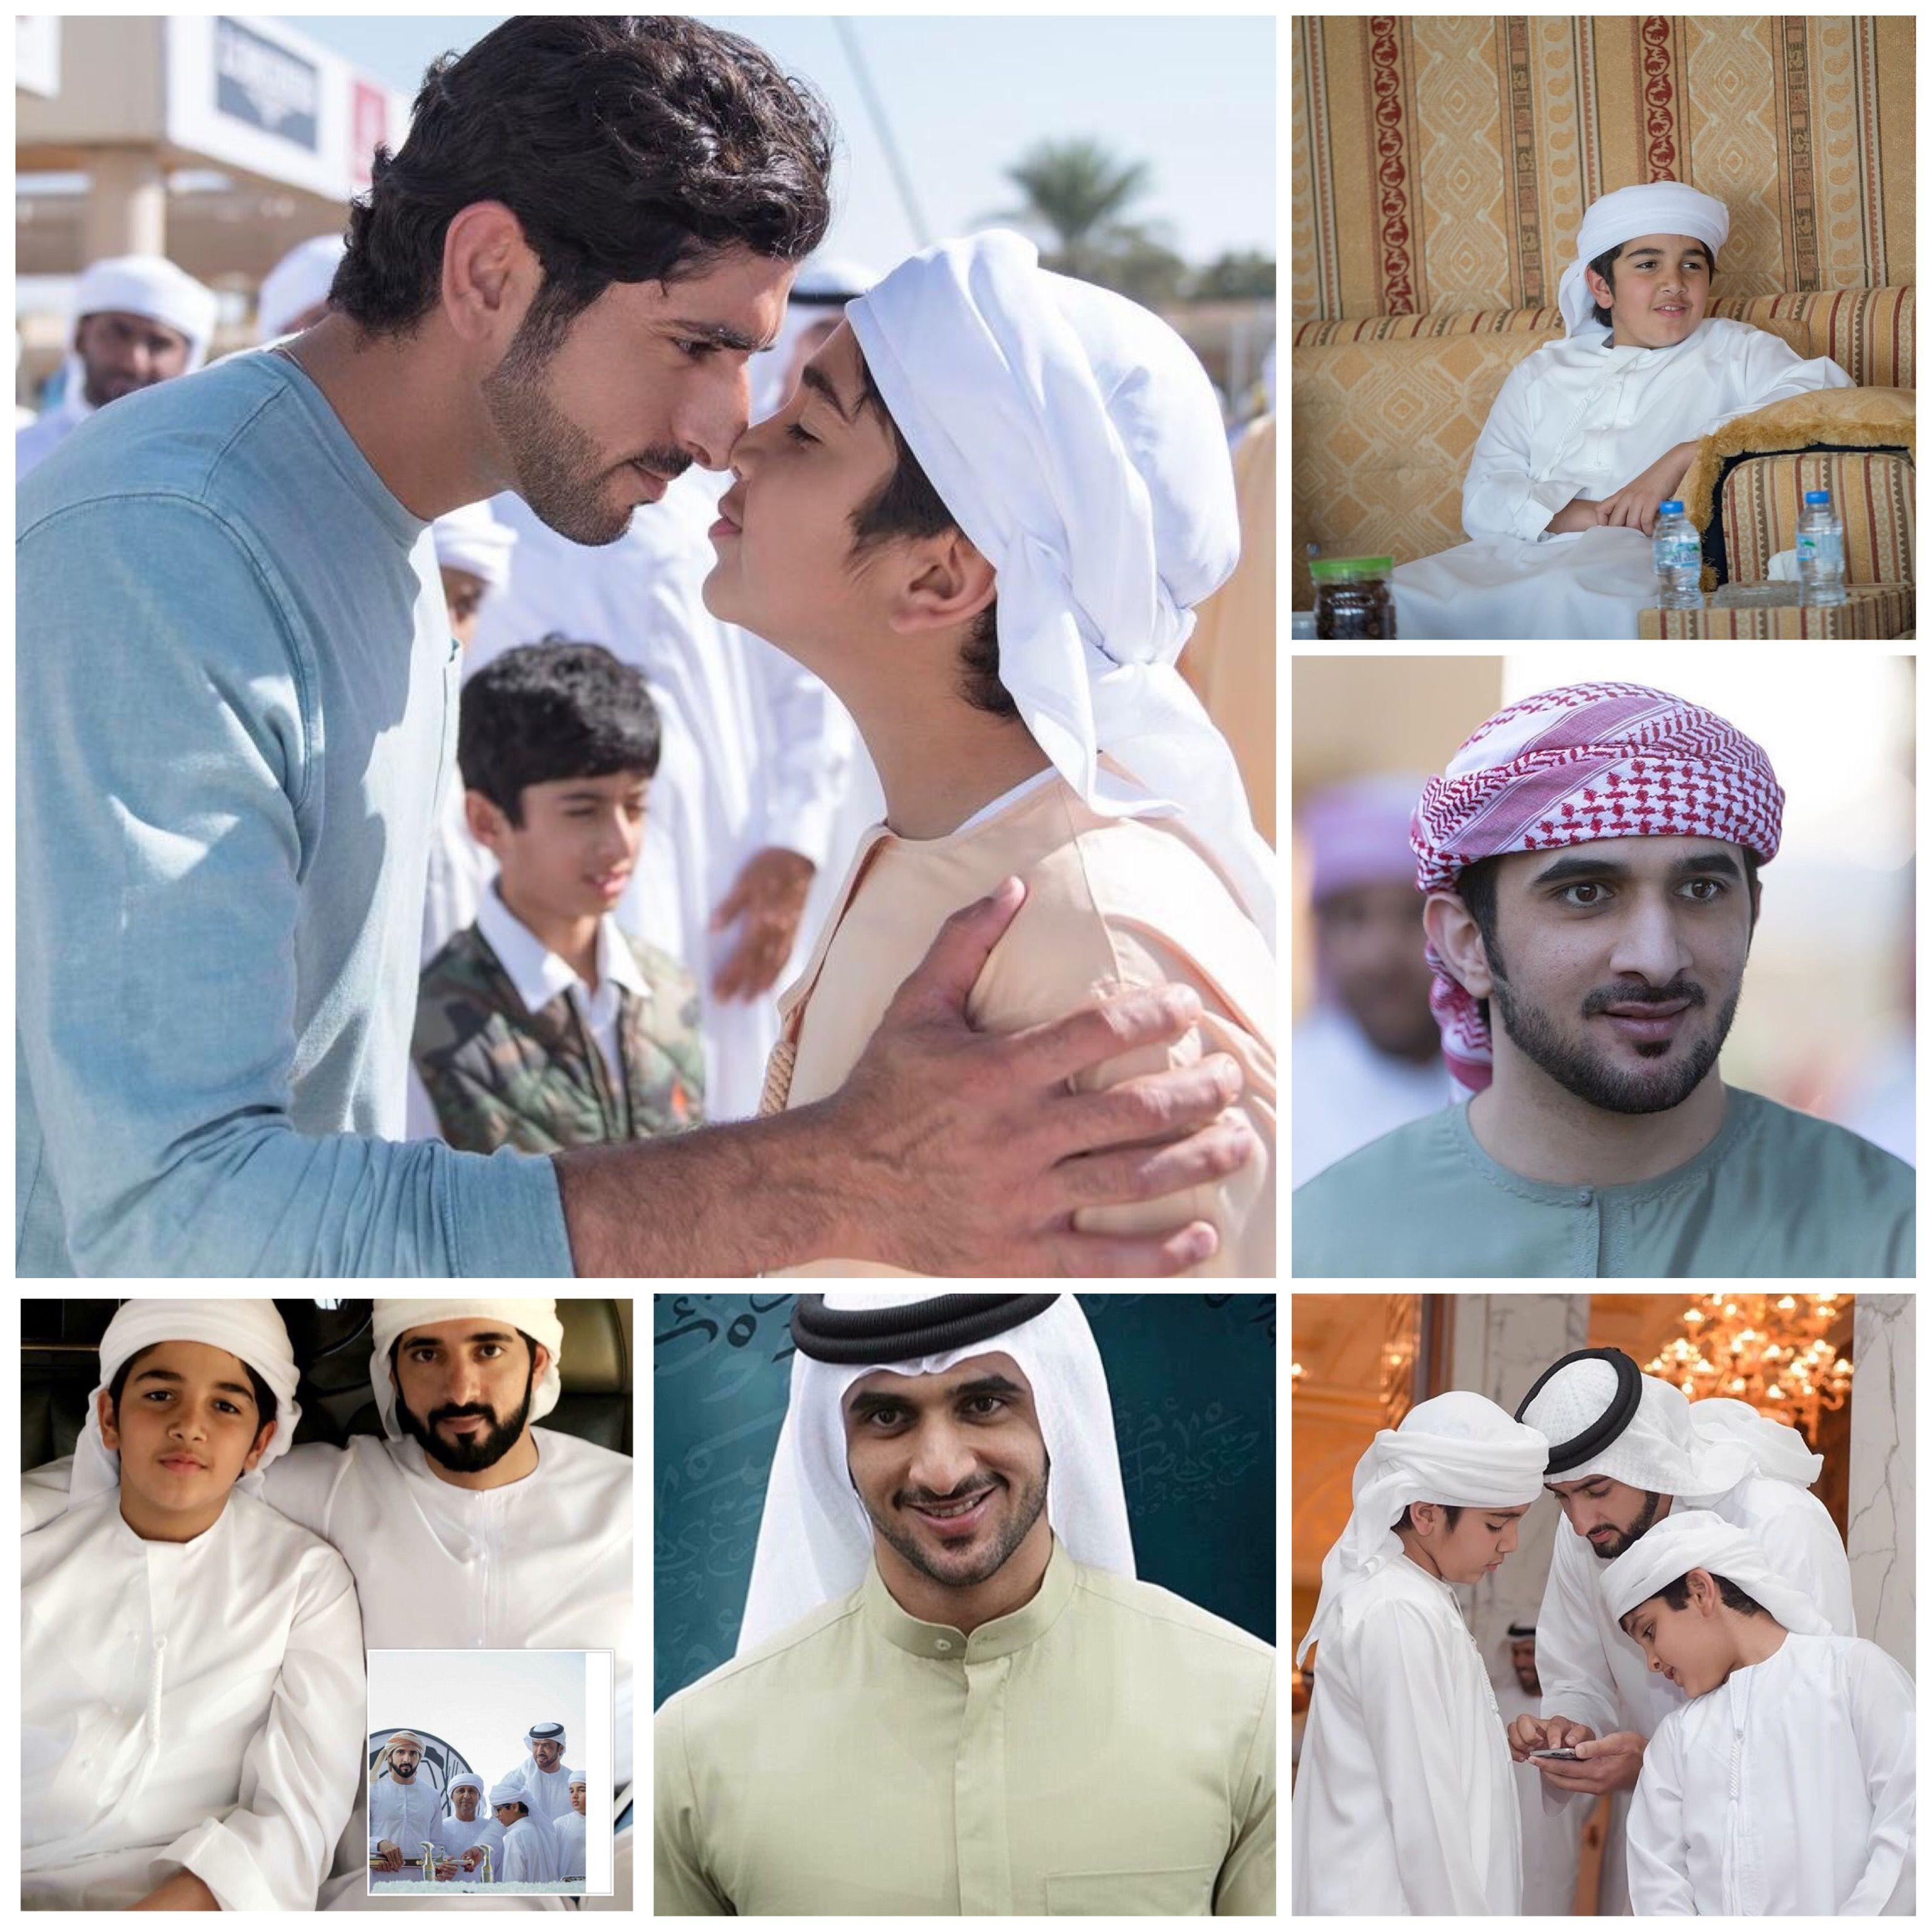 Majid Prince Al Wife Maktoum